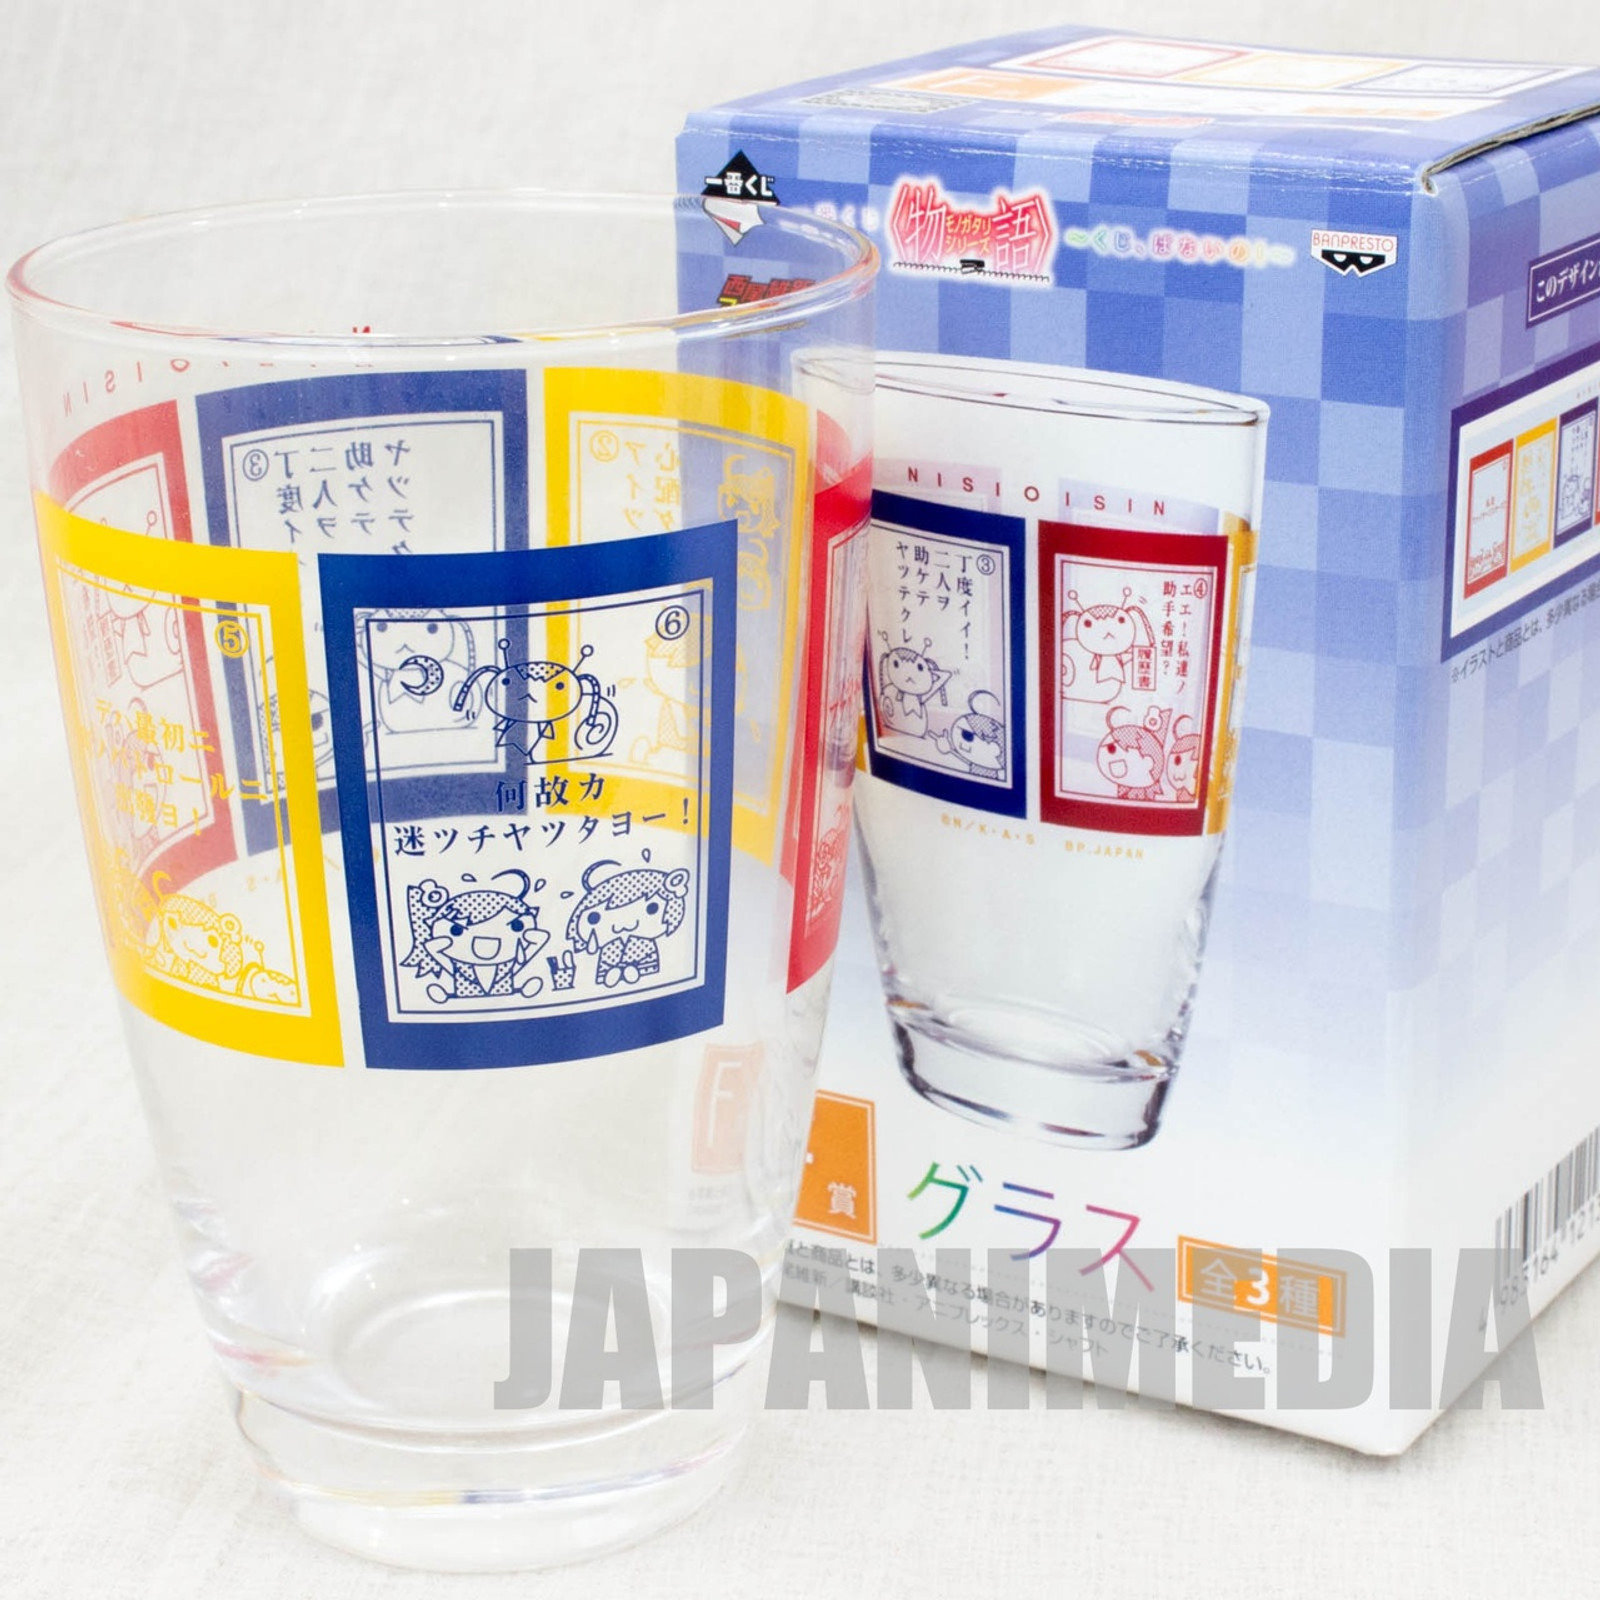 Monogatari Series Glass [ Karen Araragi / Tsukihi Araragi ] Banpresto JAPAN ANIME 1